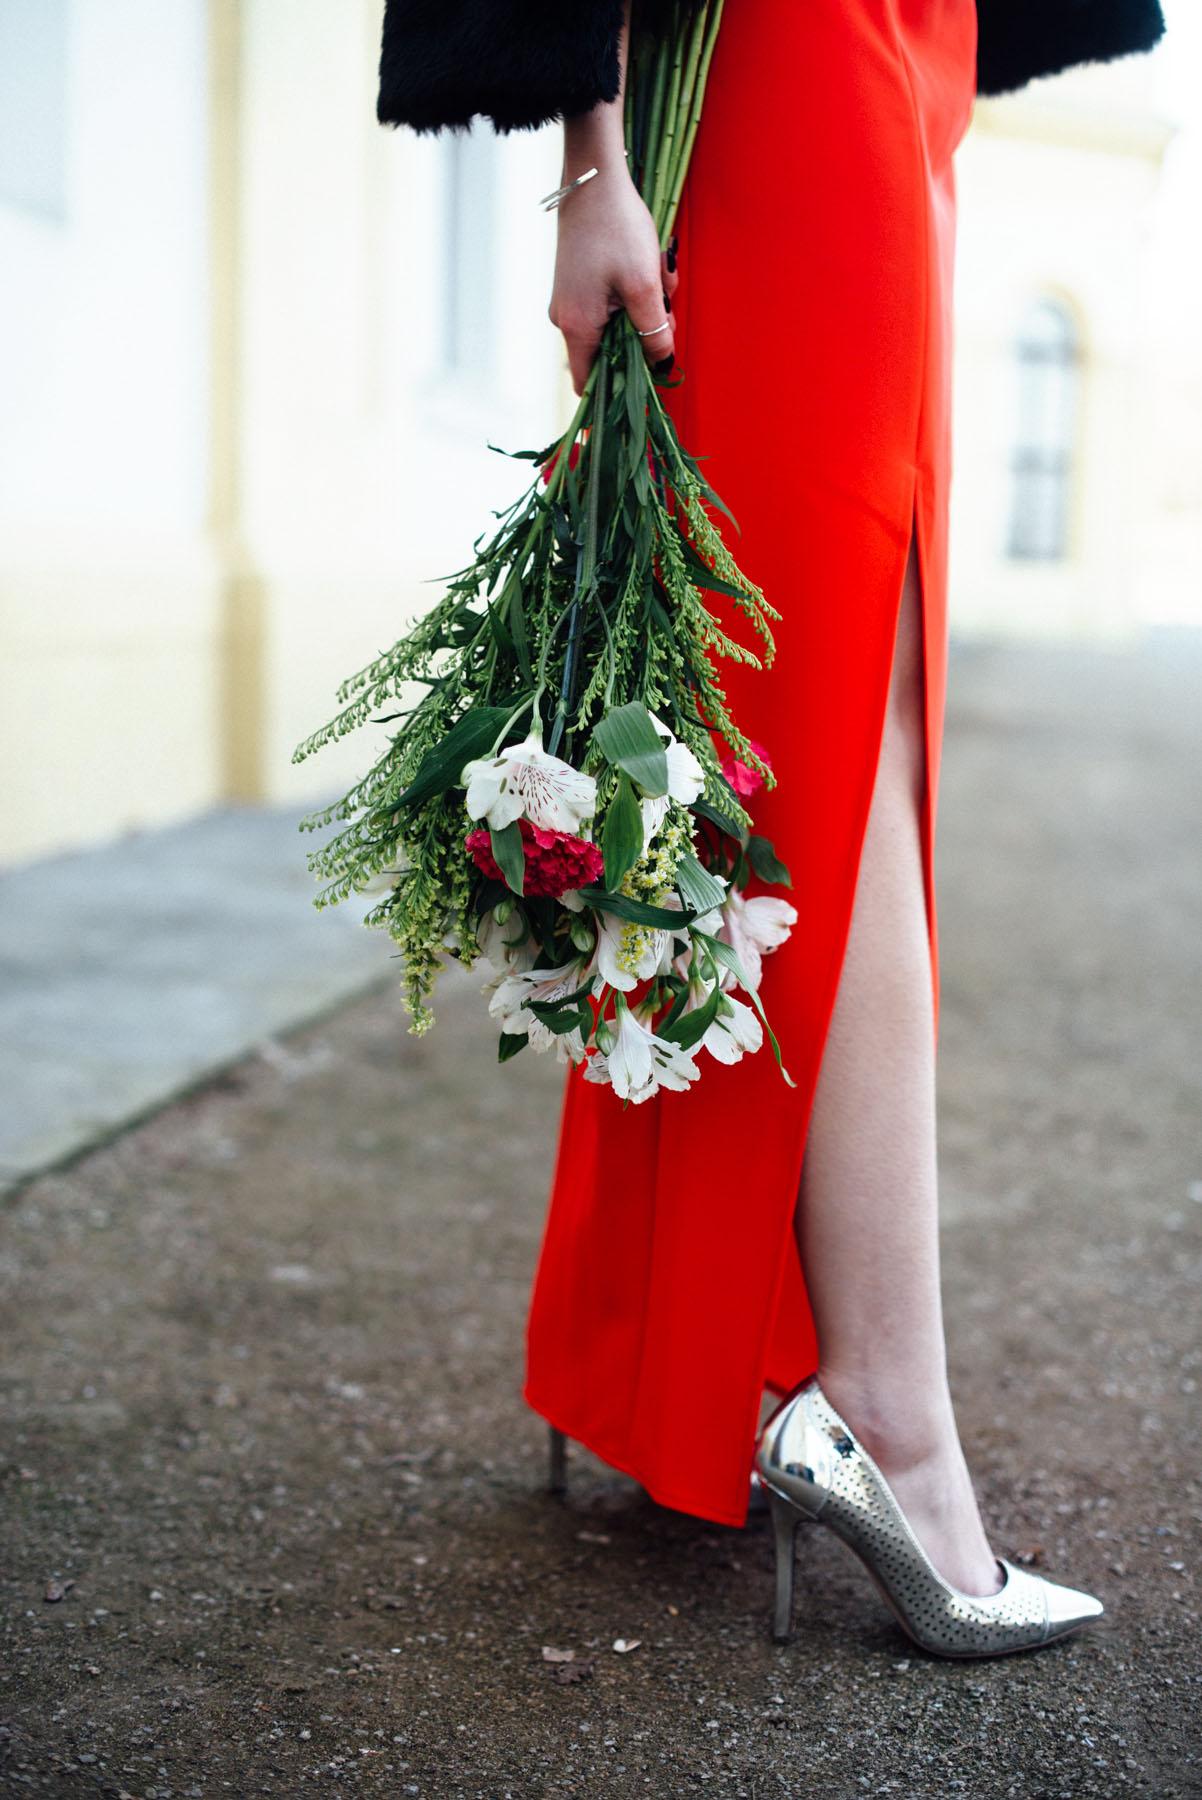 Kiamisu_Modeblog_Fashionblog_divodress_Abendkleid rot_mybloomydays_bouquet_Abendmode-final